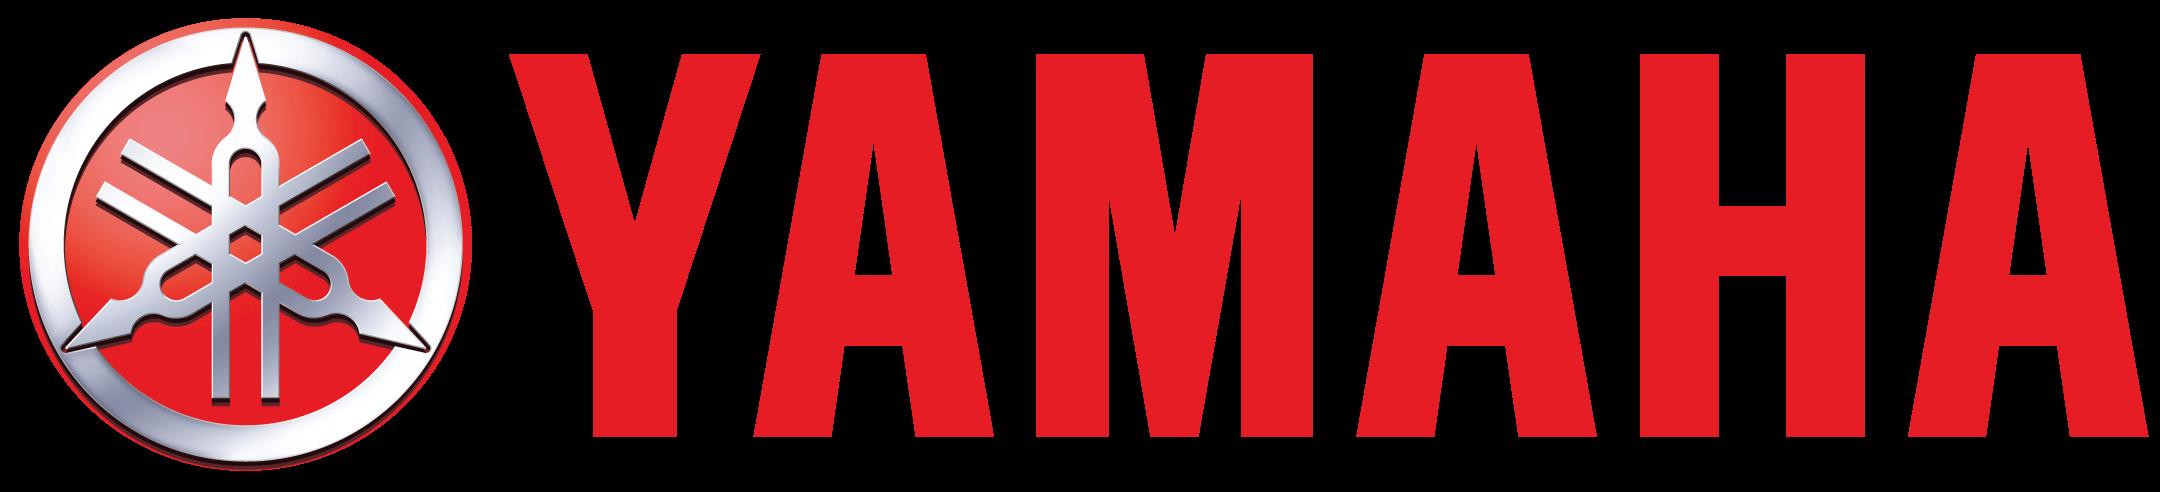 Pembuatan Video Company Profile Yamaha oleh Bie Multi Kreasi